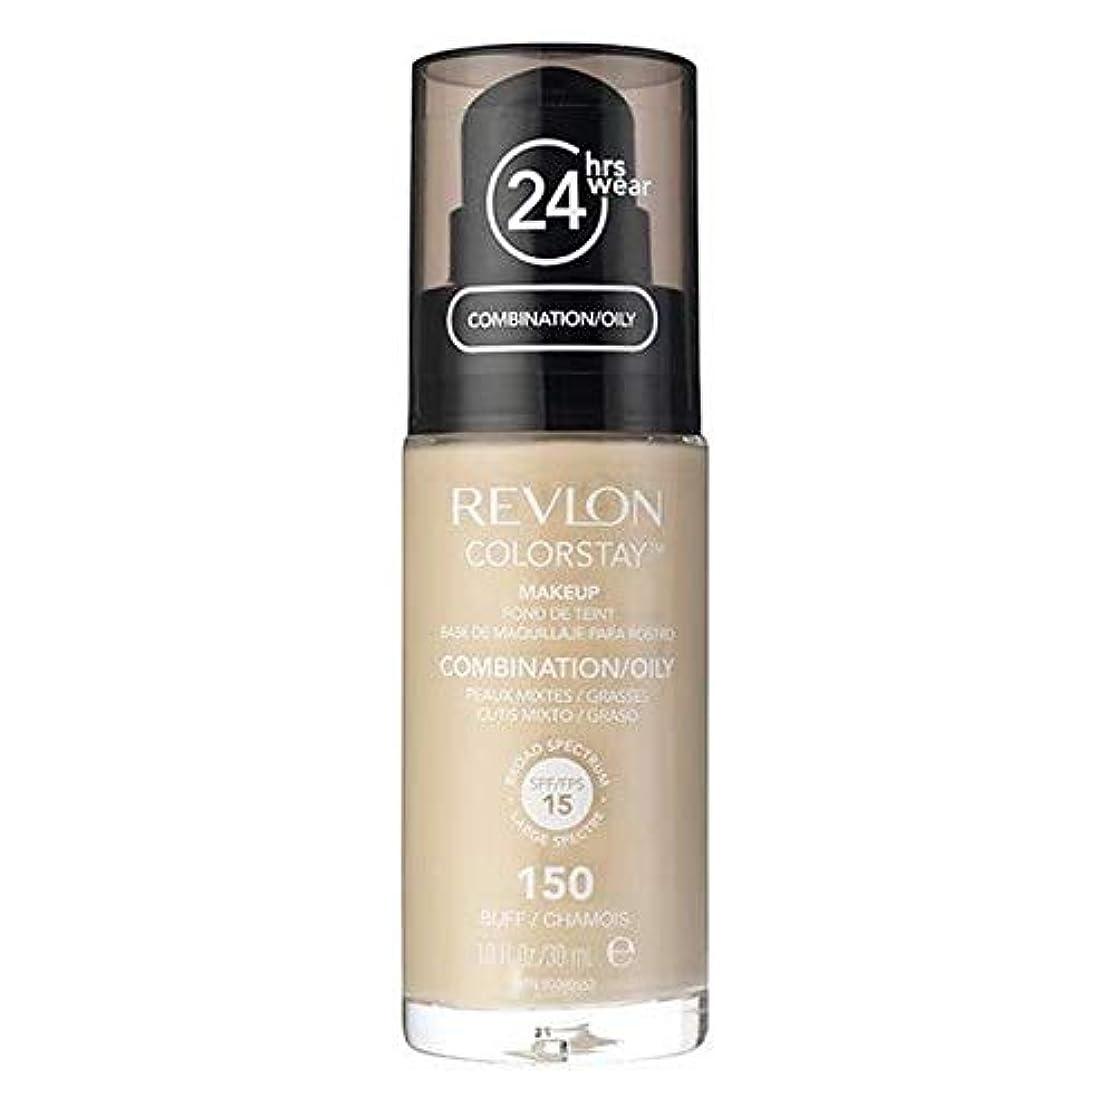 [Revlon ] レブロンカラーステイ基盤コンビ/油性バフ30ミリリットル - Revlon Color Stay Foundation Combi/Oily Buff 30ml [並行輸入品]